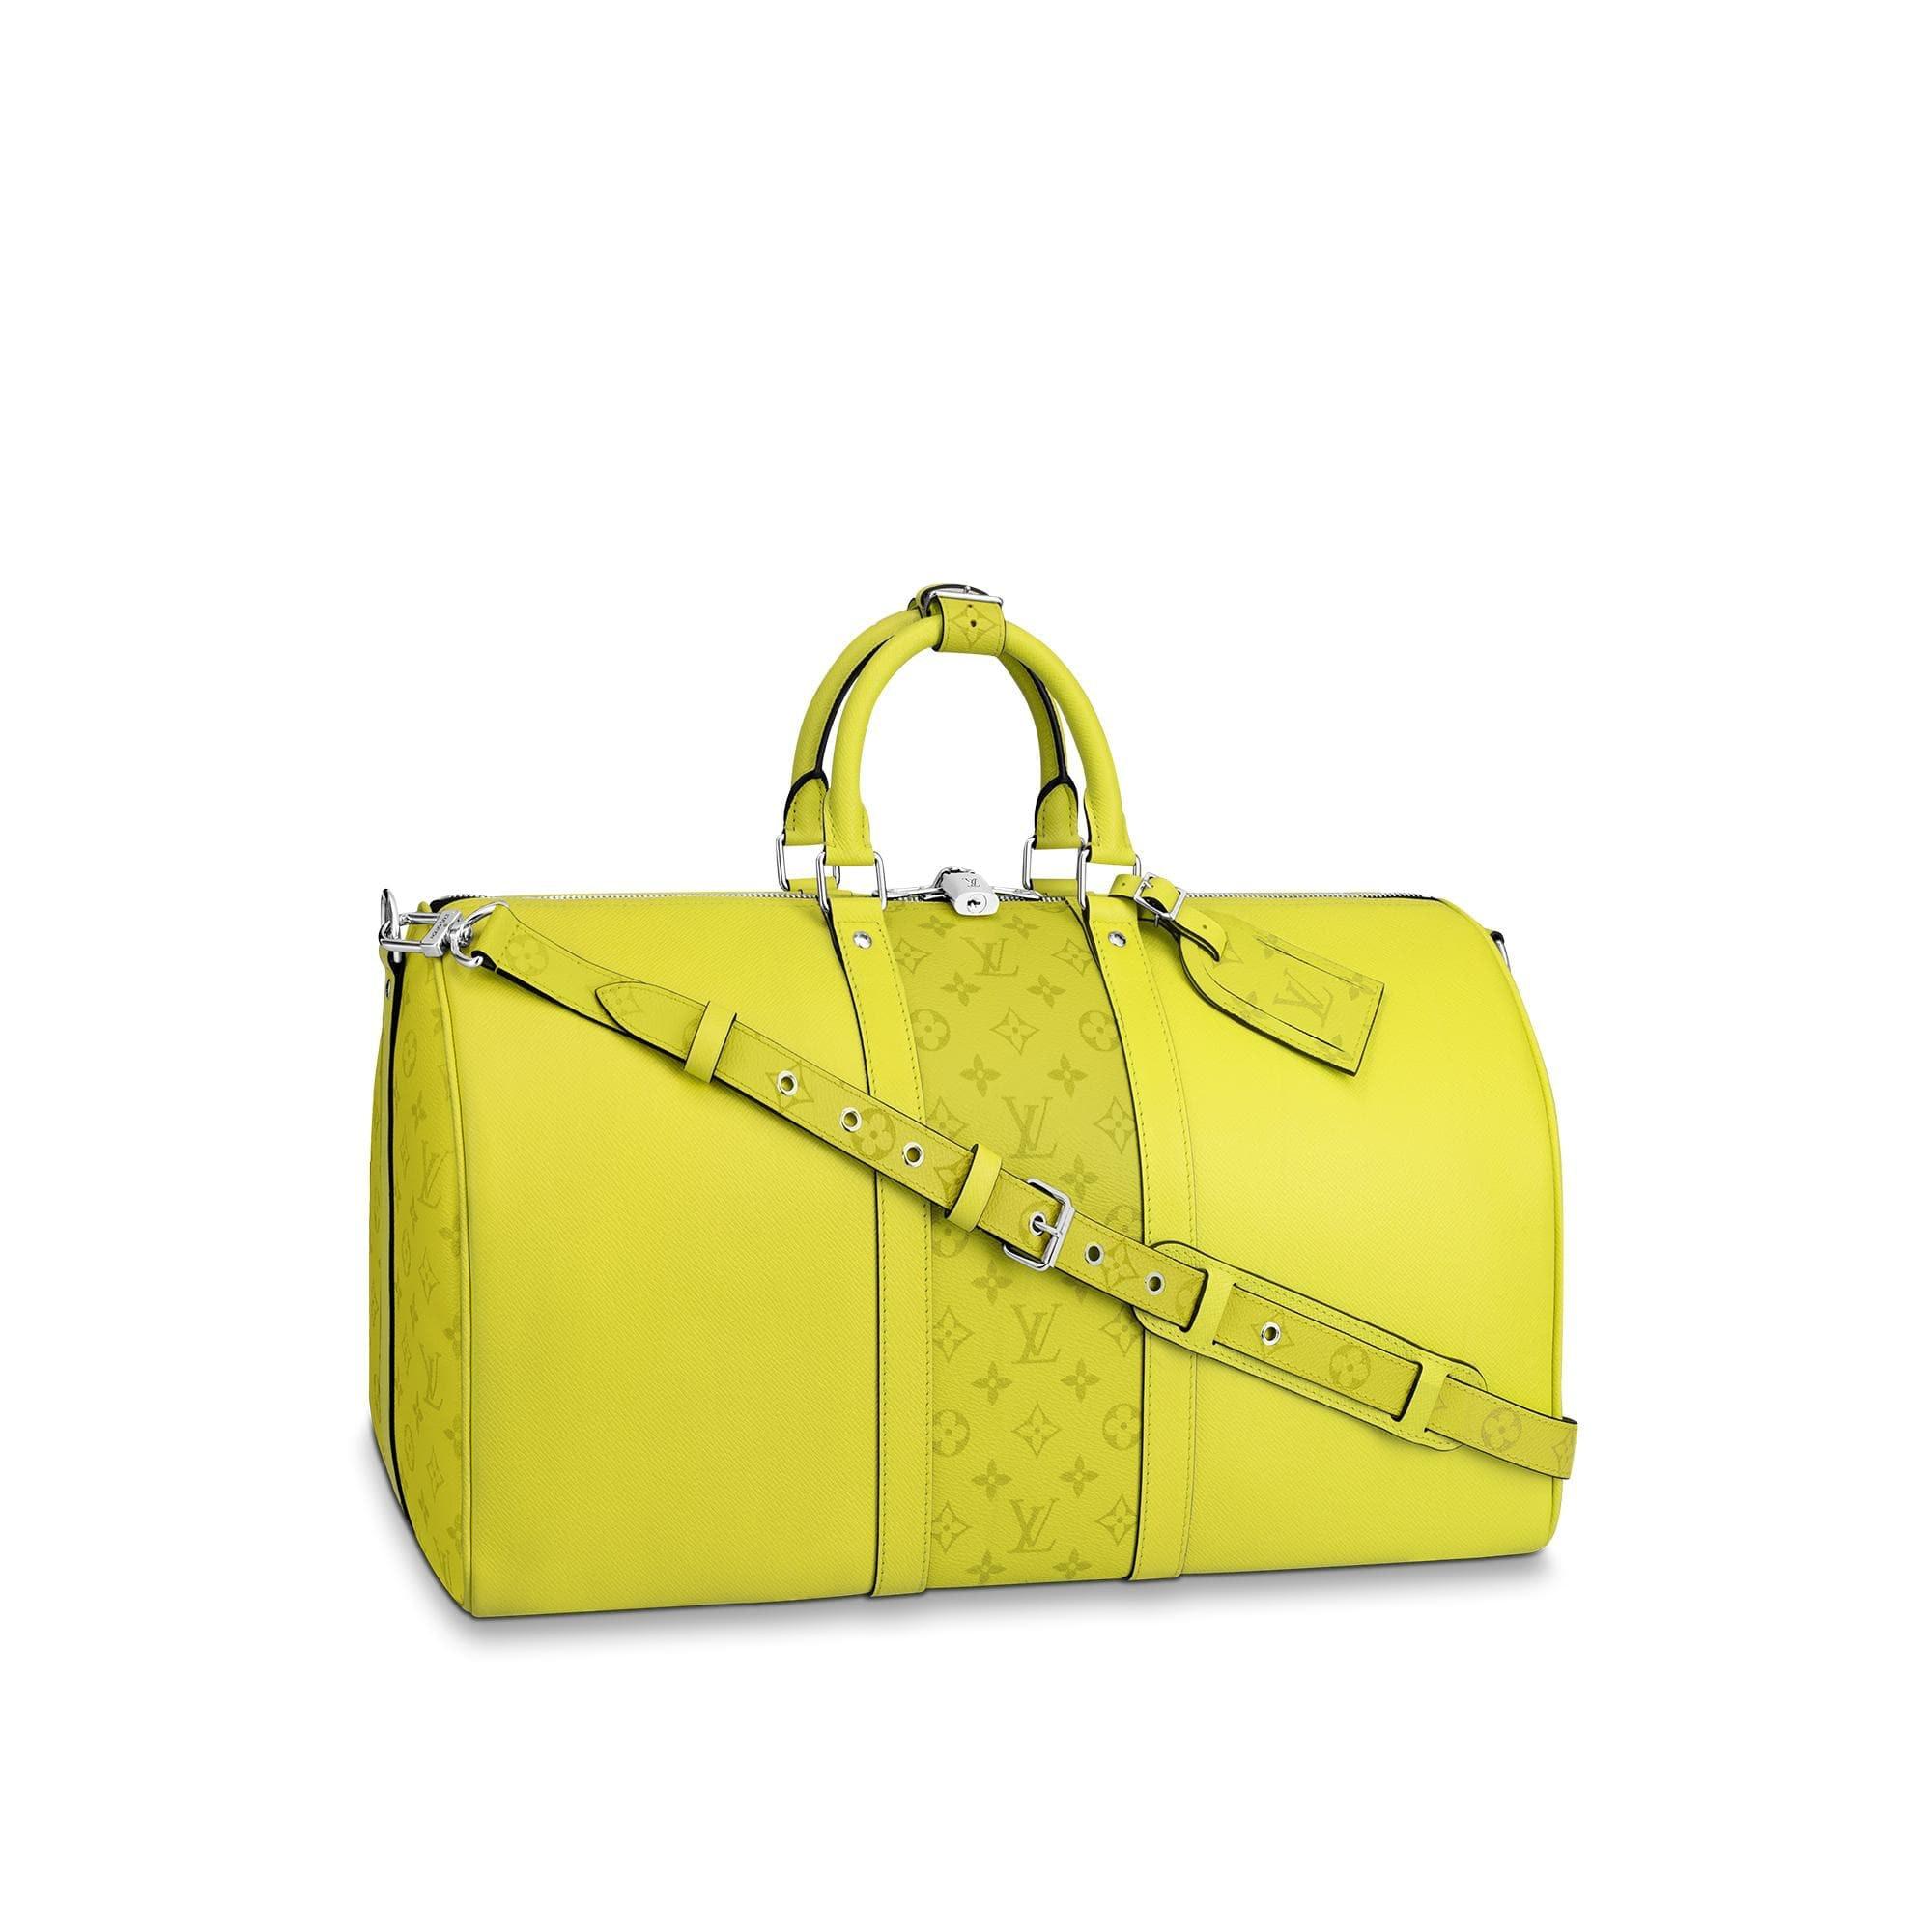 Louis Vuitton Keepall Bandouliere Monogram Bahia Taiga 50 Yellow